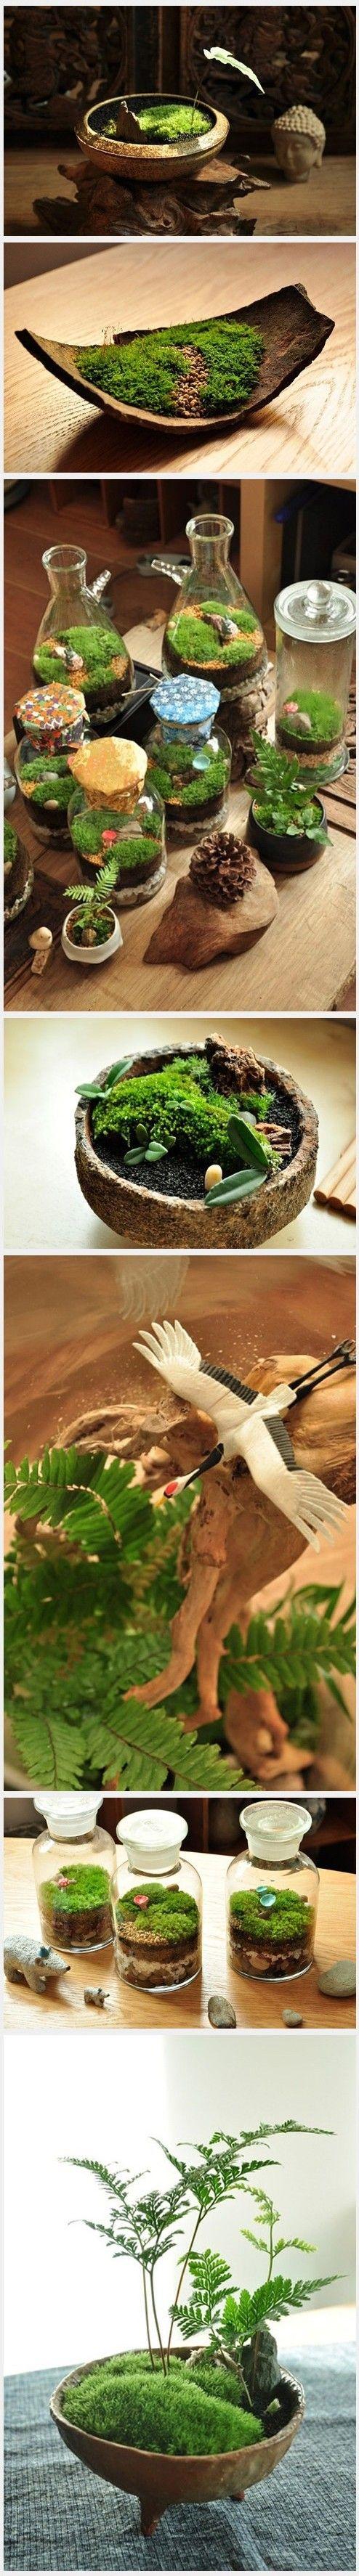 Mini jardins zen plantas pinterest jardins zen mini for Jardins zen miniatures